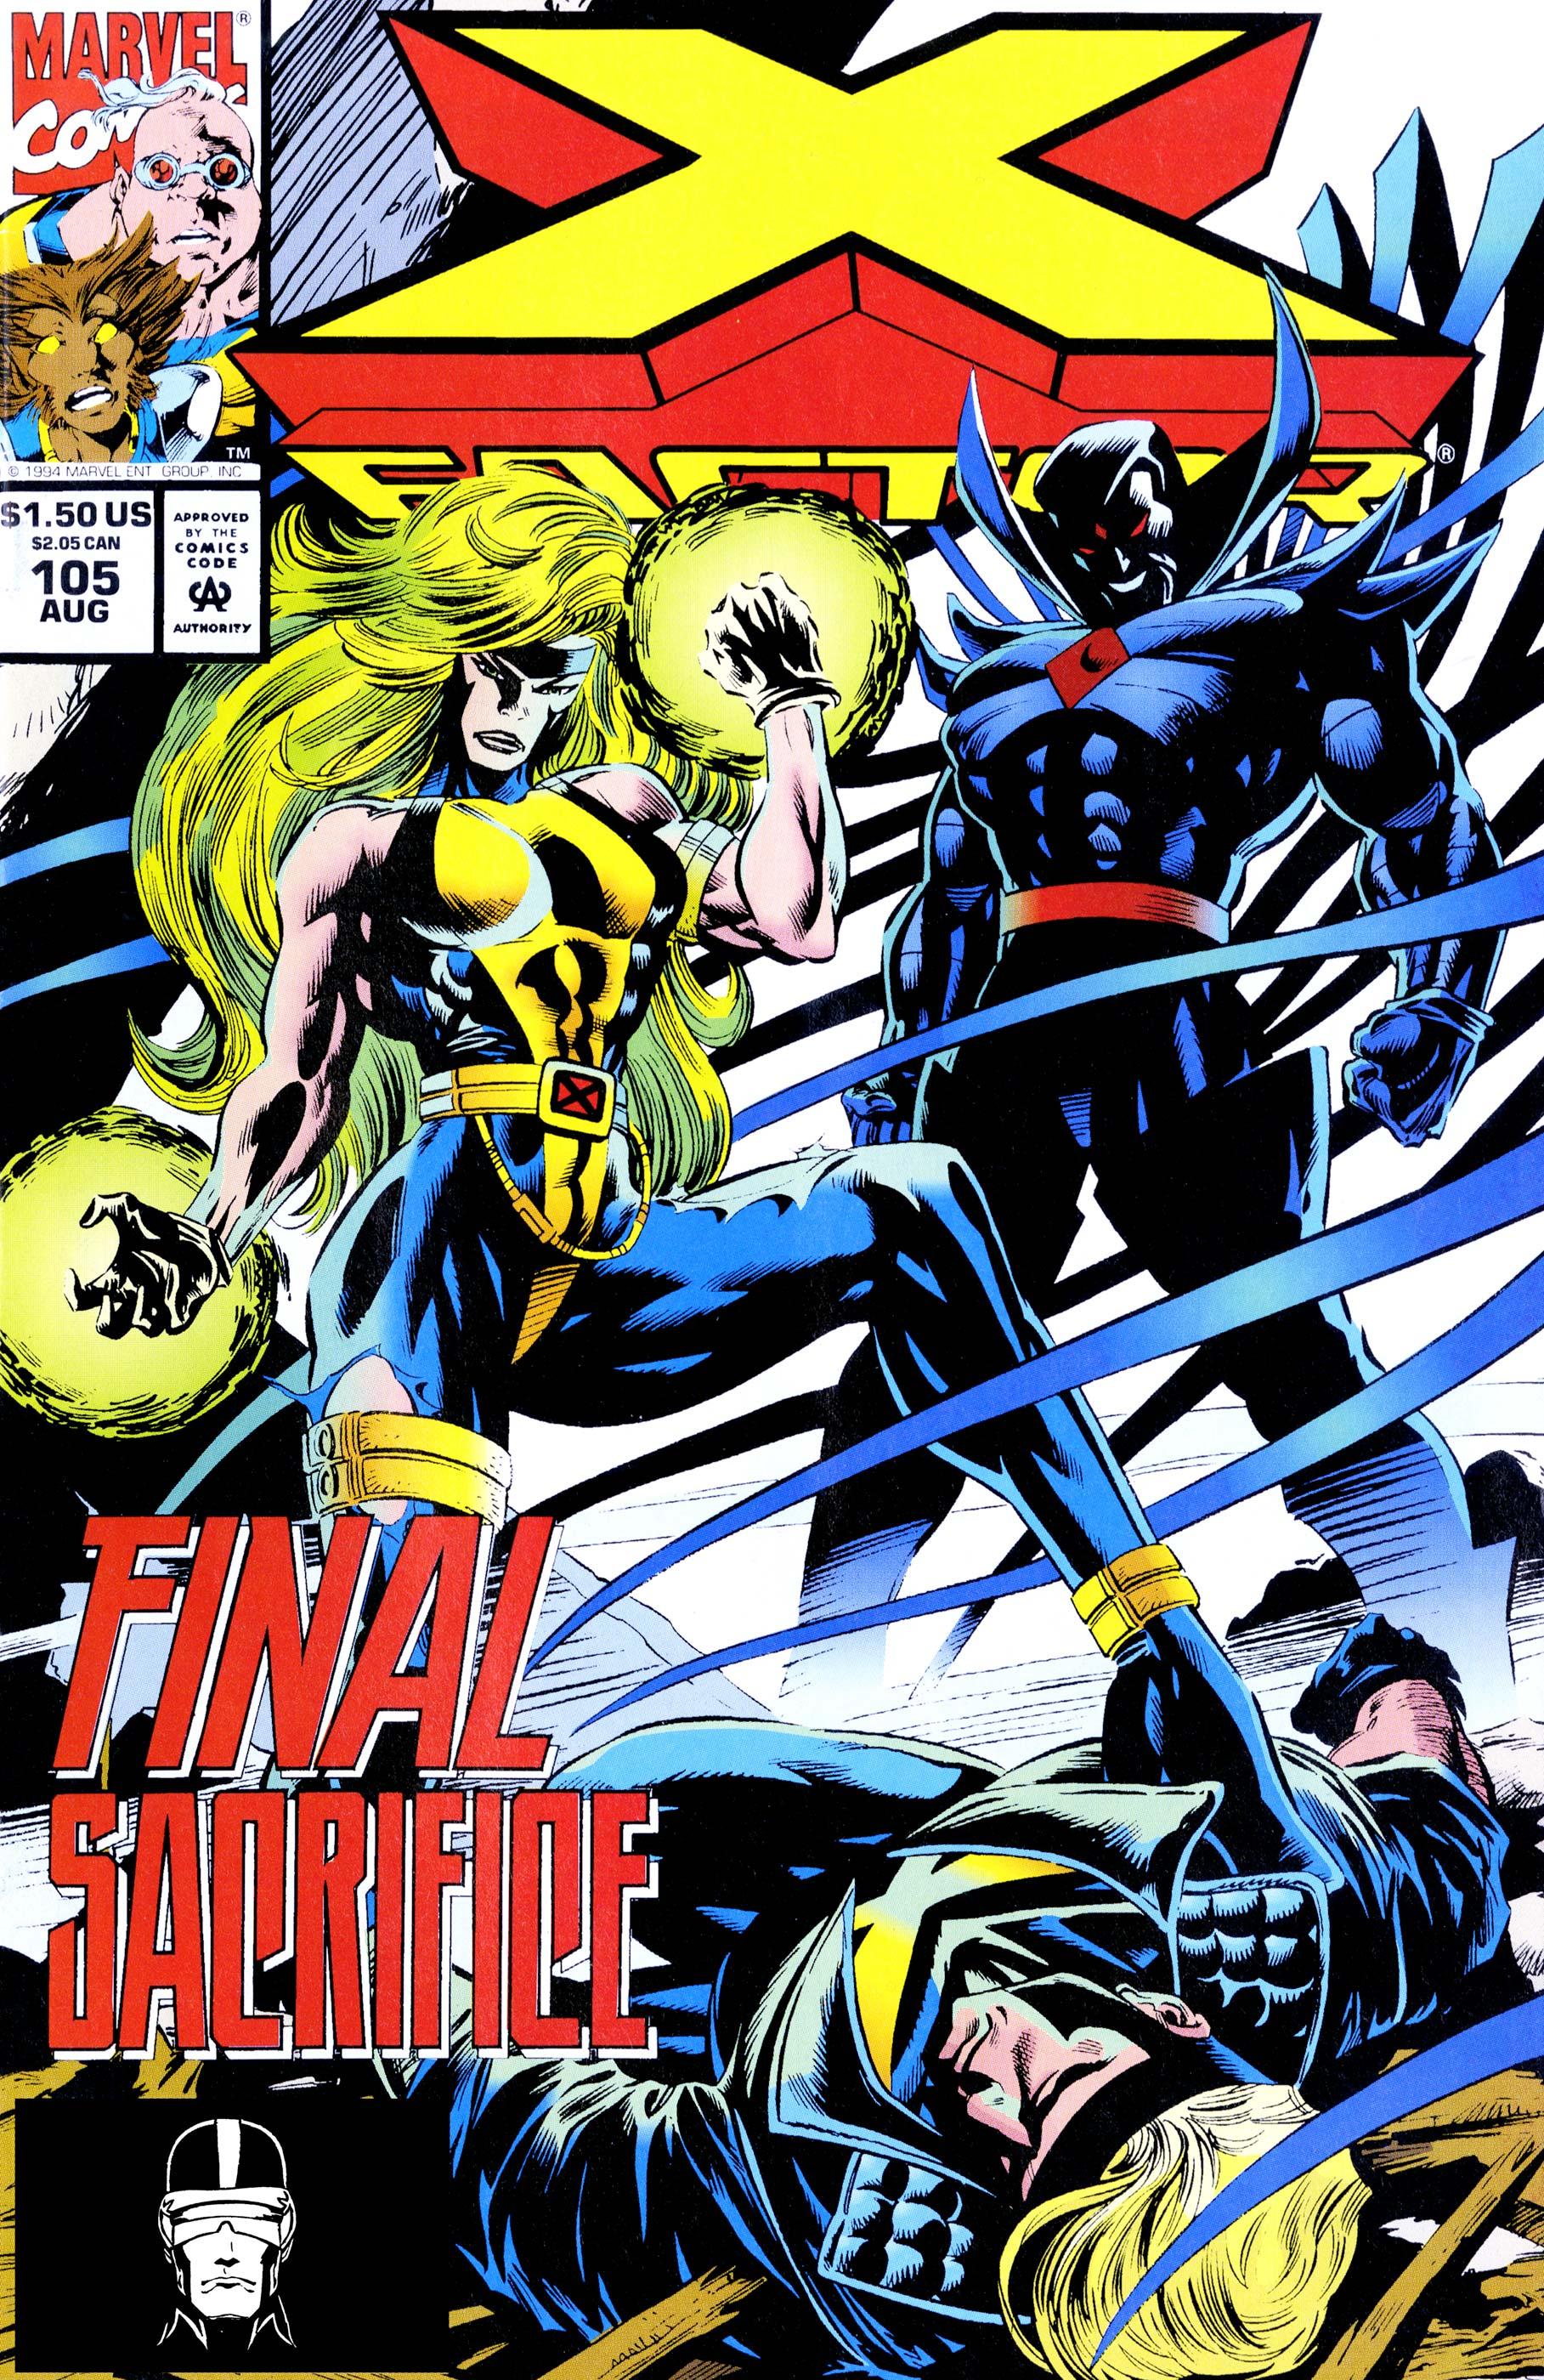 X-Factor (1986) #105